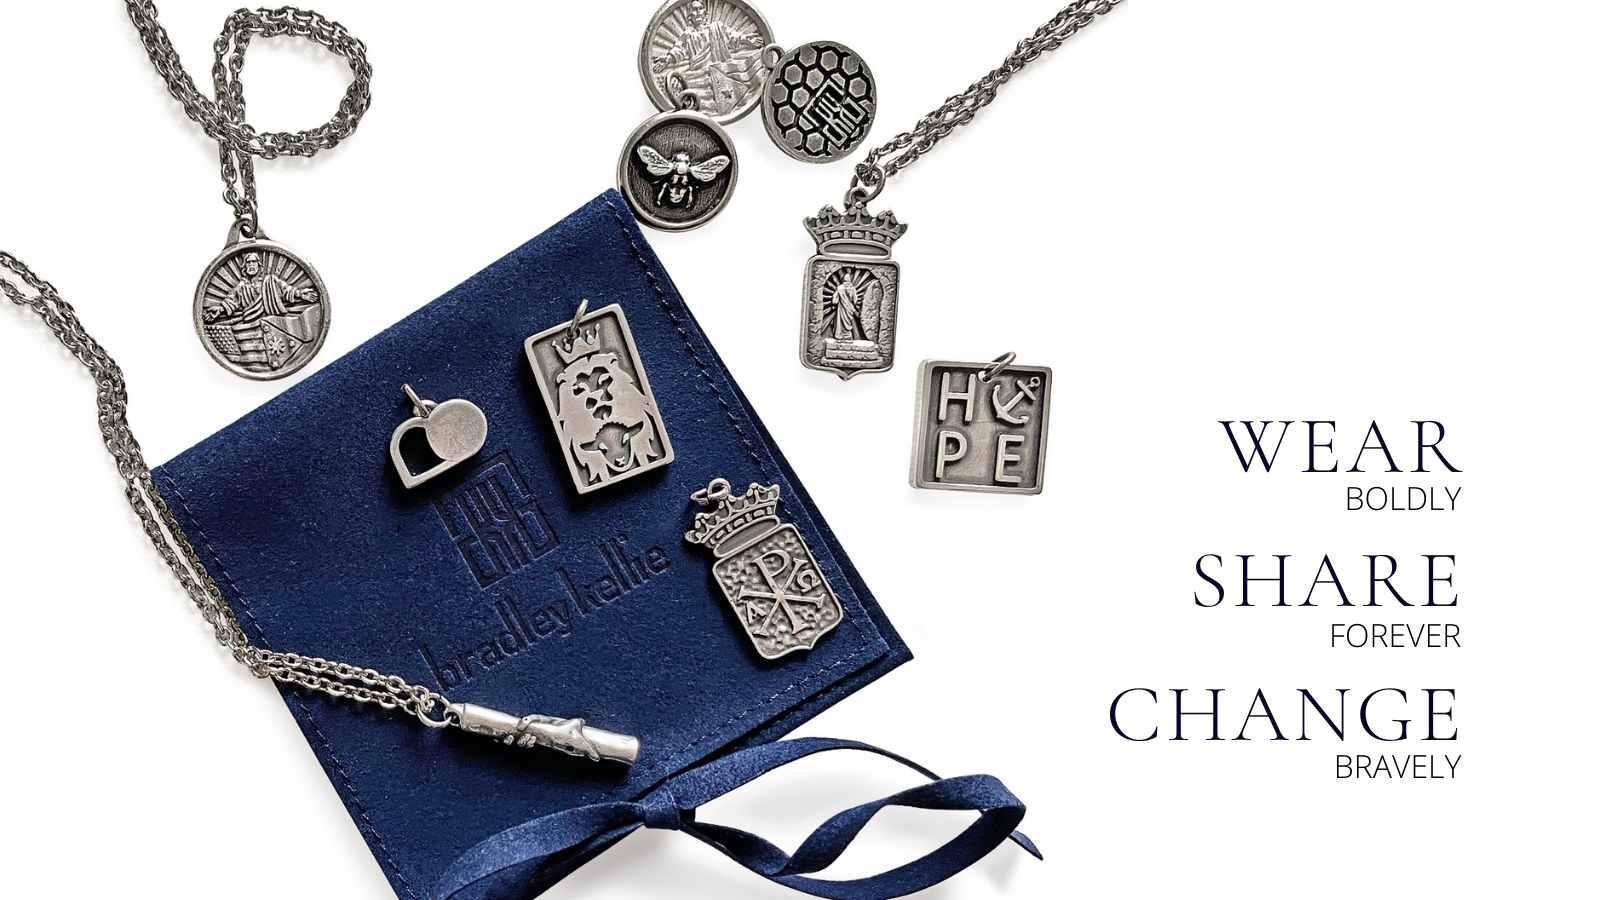 Bradley Kellie Christian Jewelry Faith Based Design Boerne Texas Hill Country